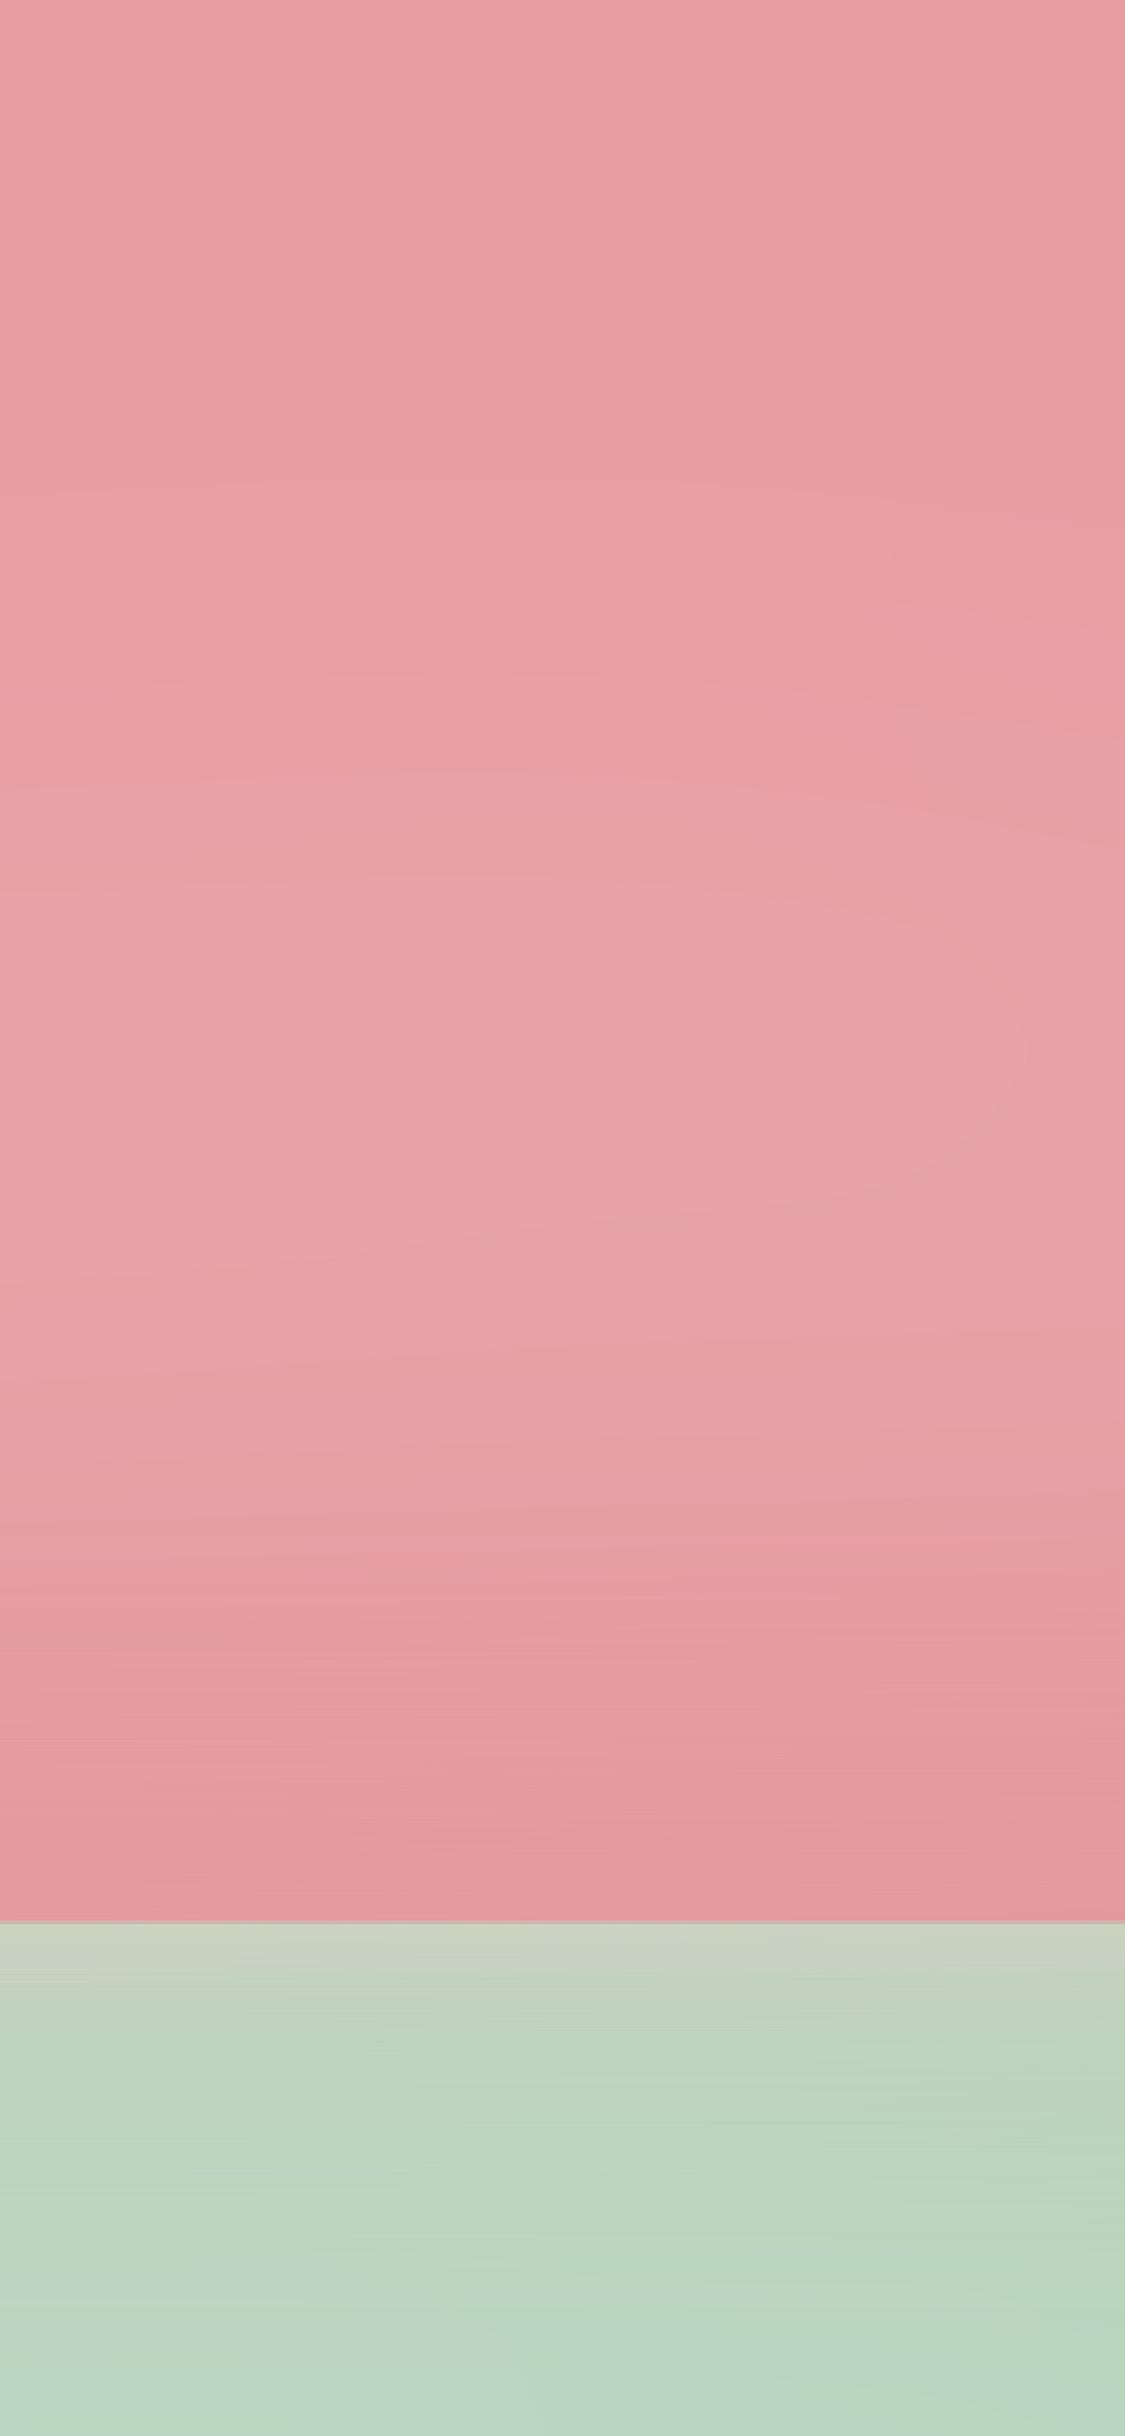 Sn36 Flat Colorlovers Orange Blur Gradation Pastel